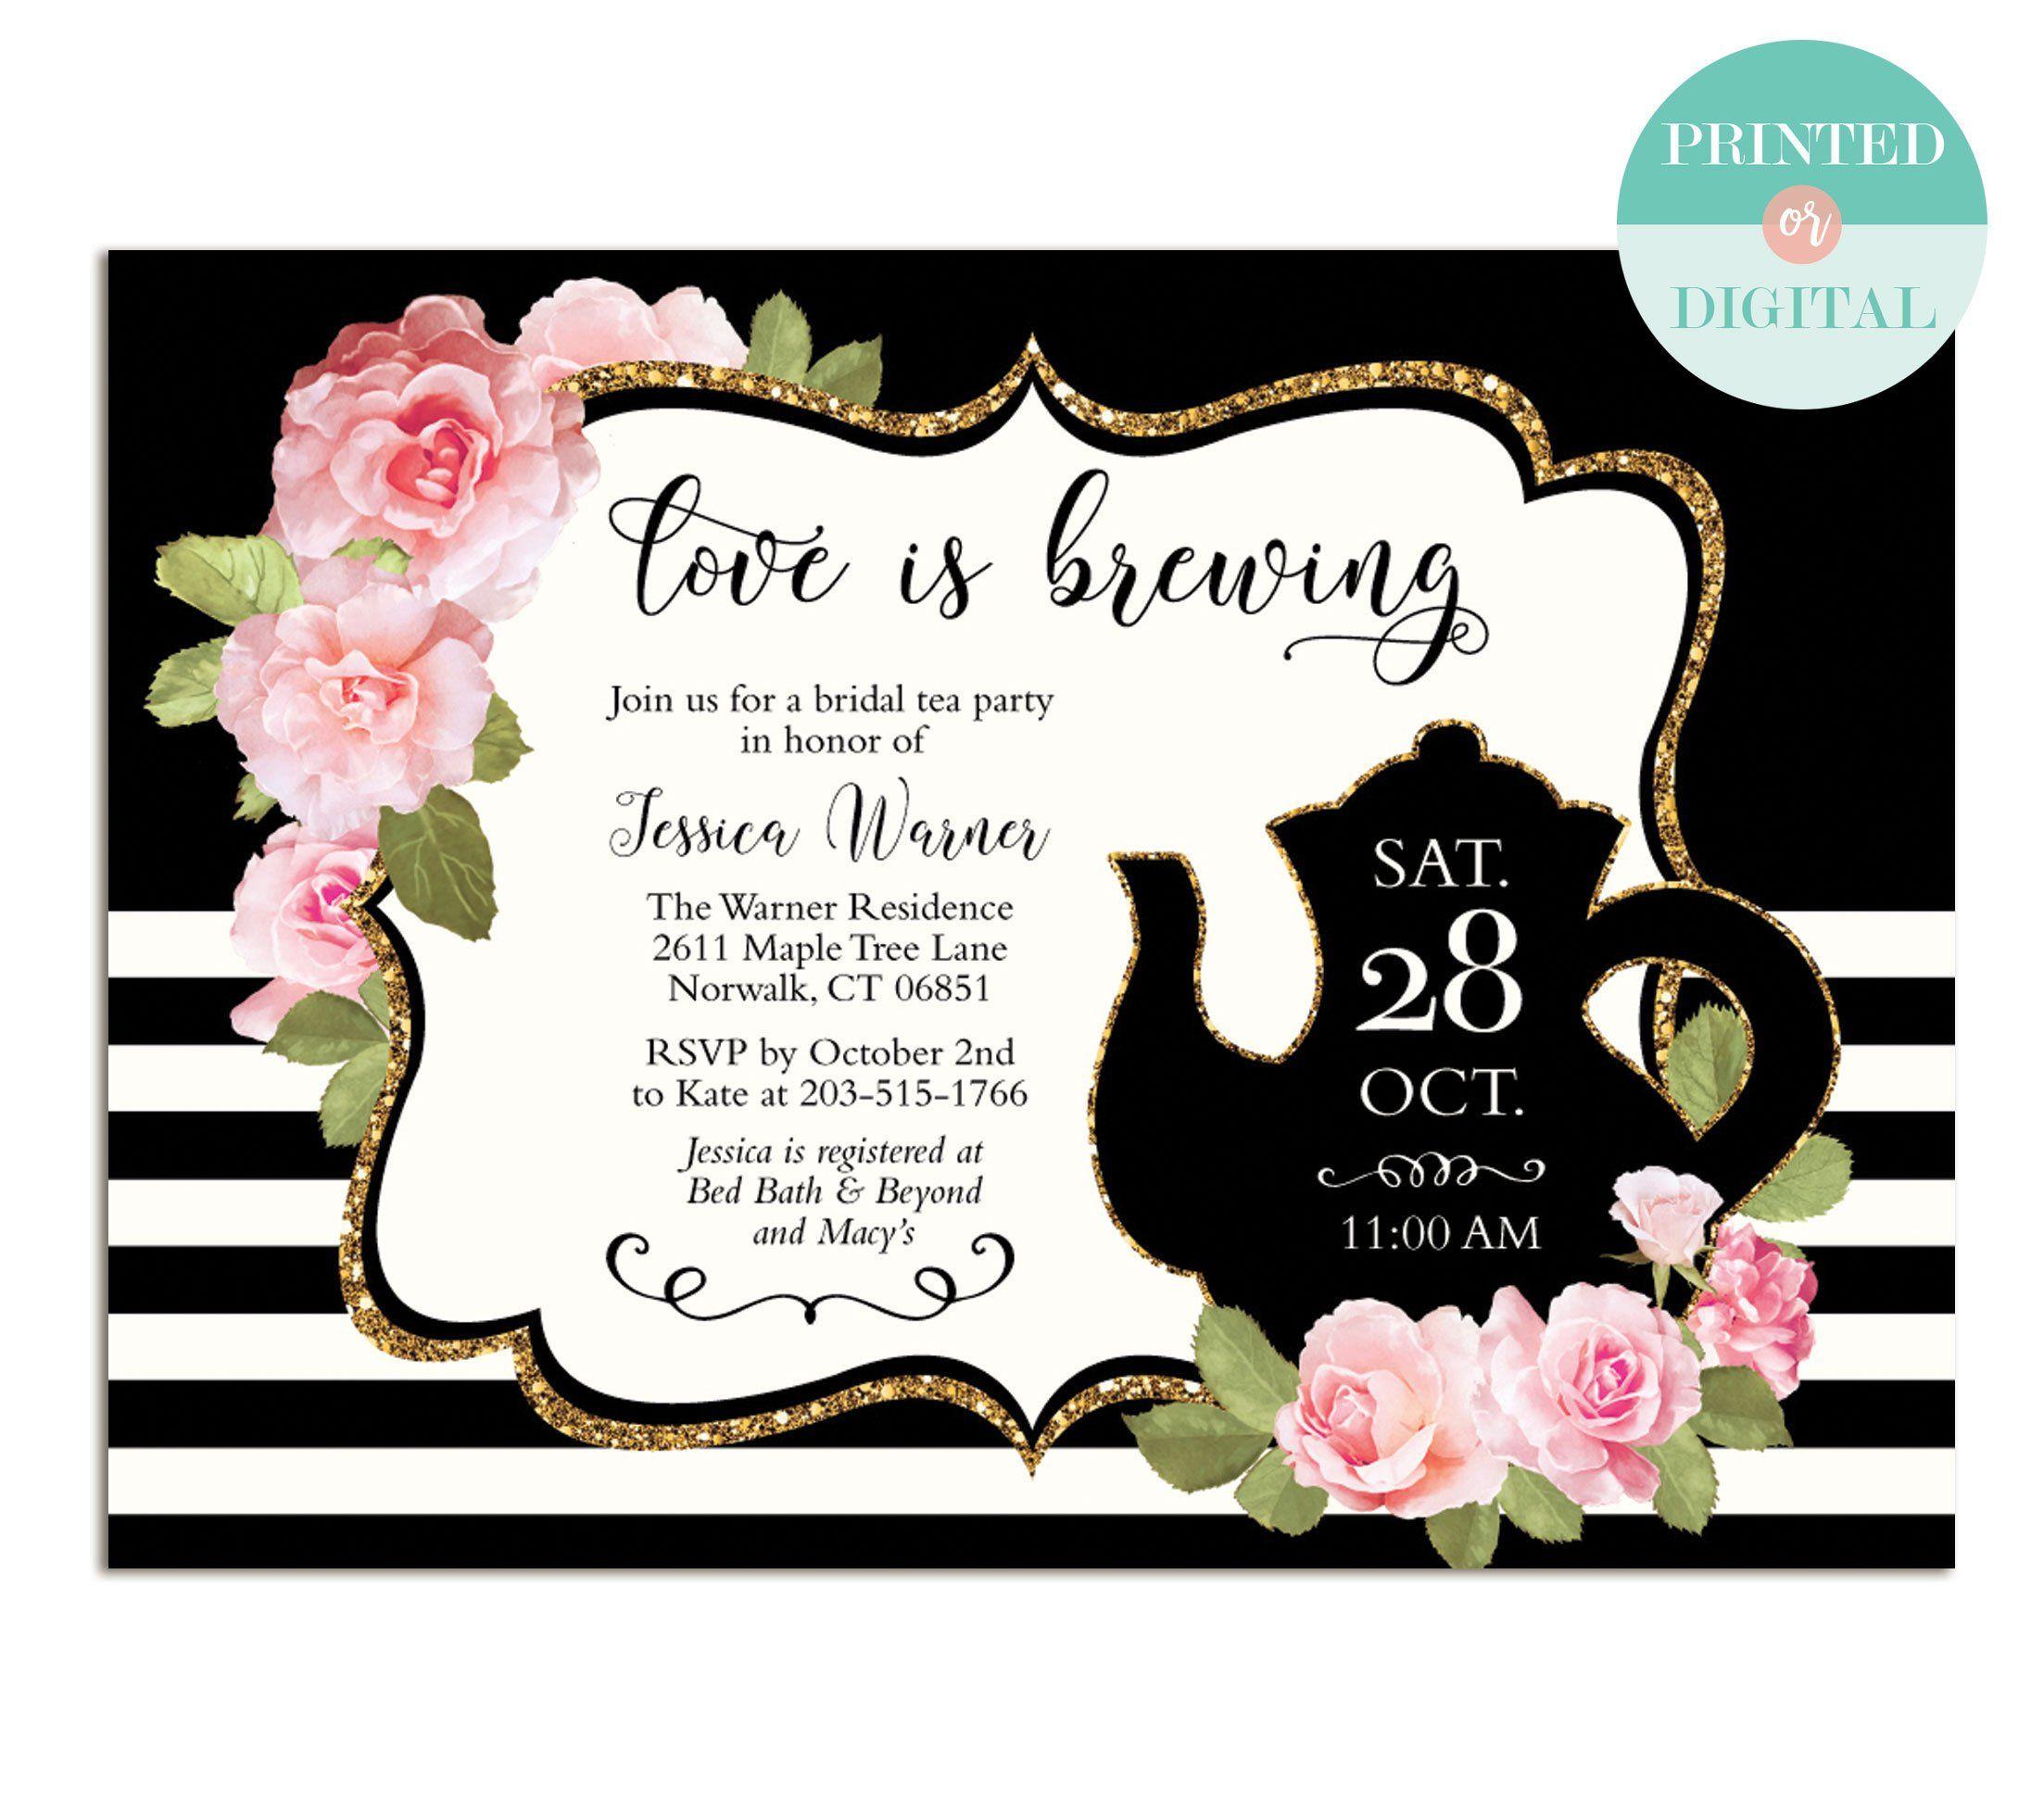 Tea Party Bridal Shower Invitations Floral Black And White Etsy Bridal Tea Invitations Tea Party Bridal Shower Invitations Tea Party Bridal Shower